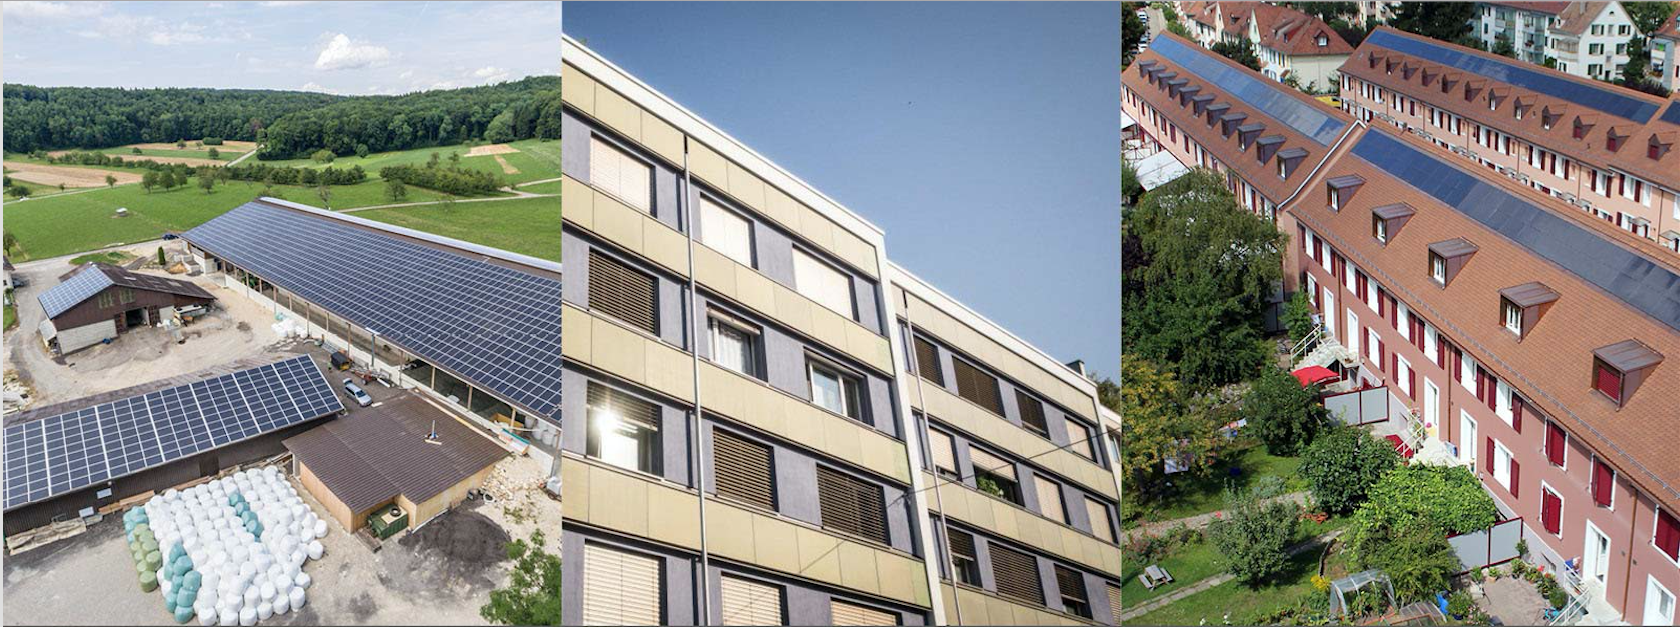 ETAVIS Wissensfrühstück Solarenergie